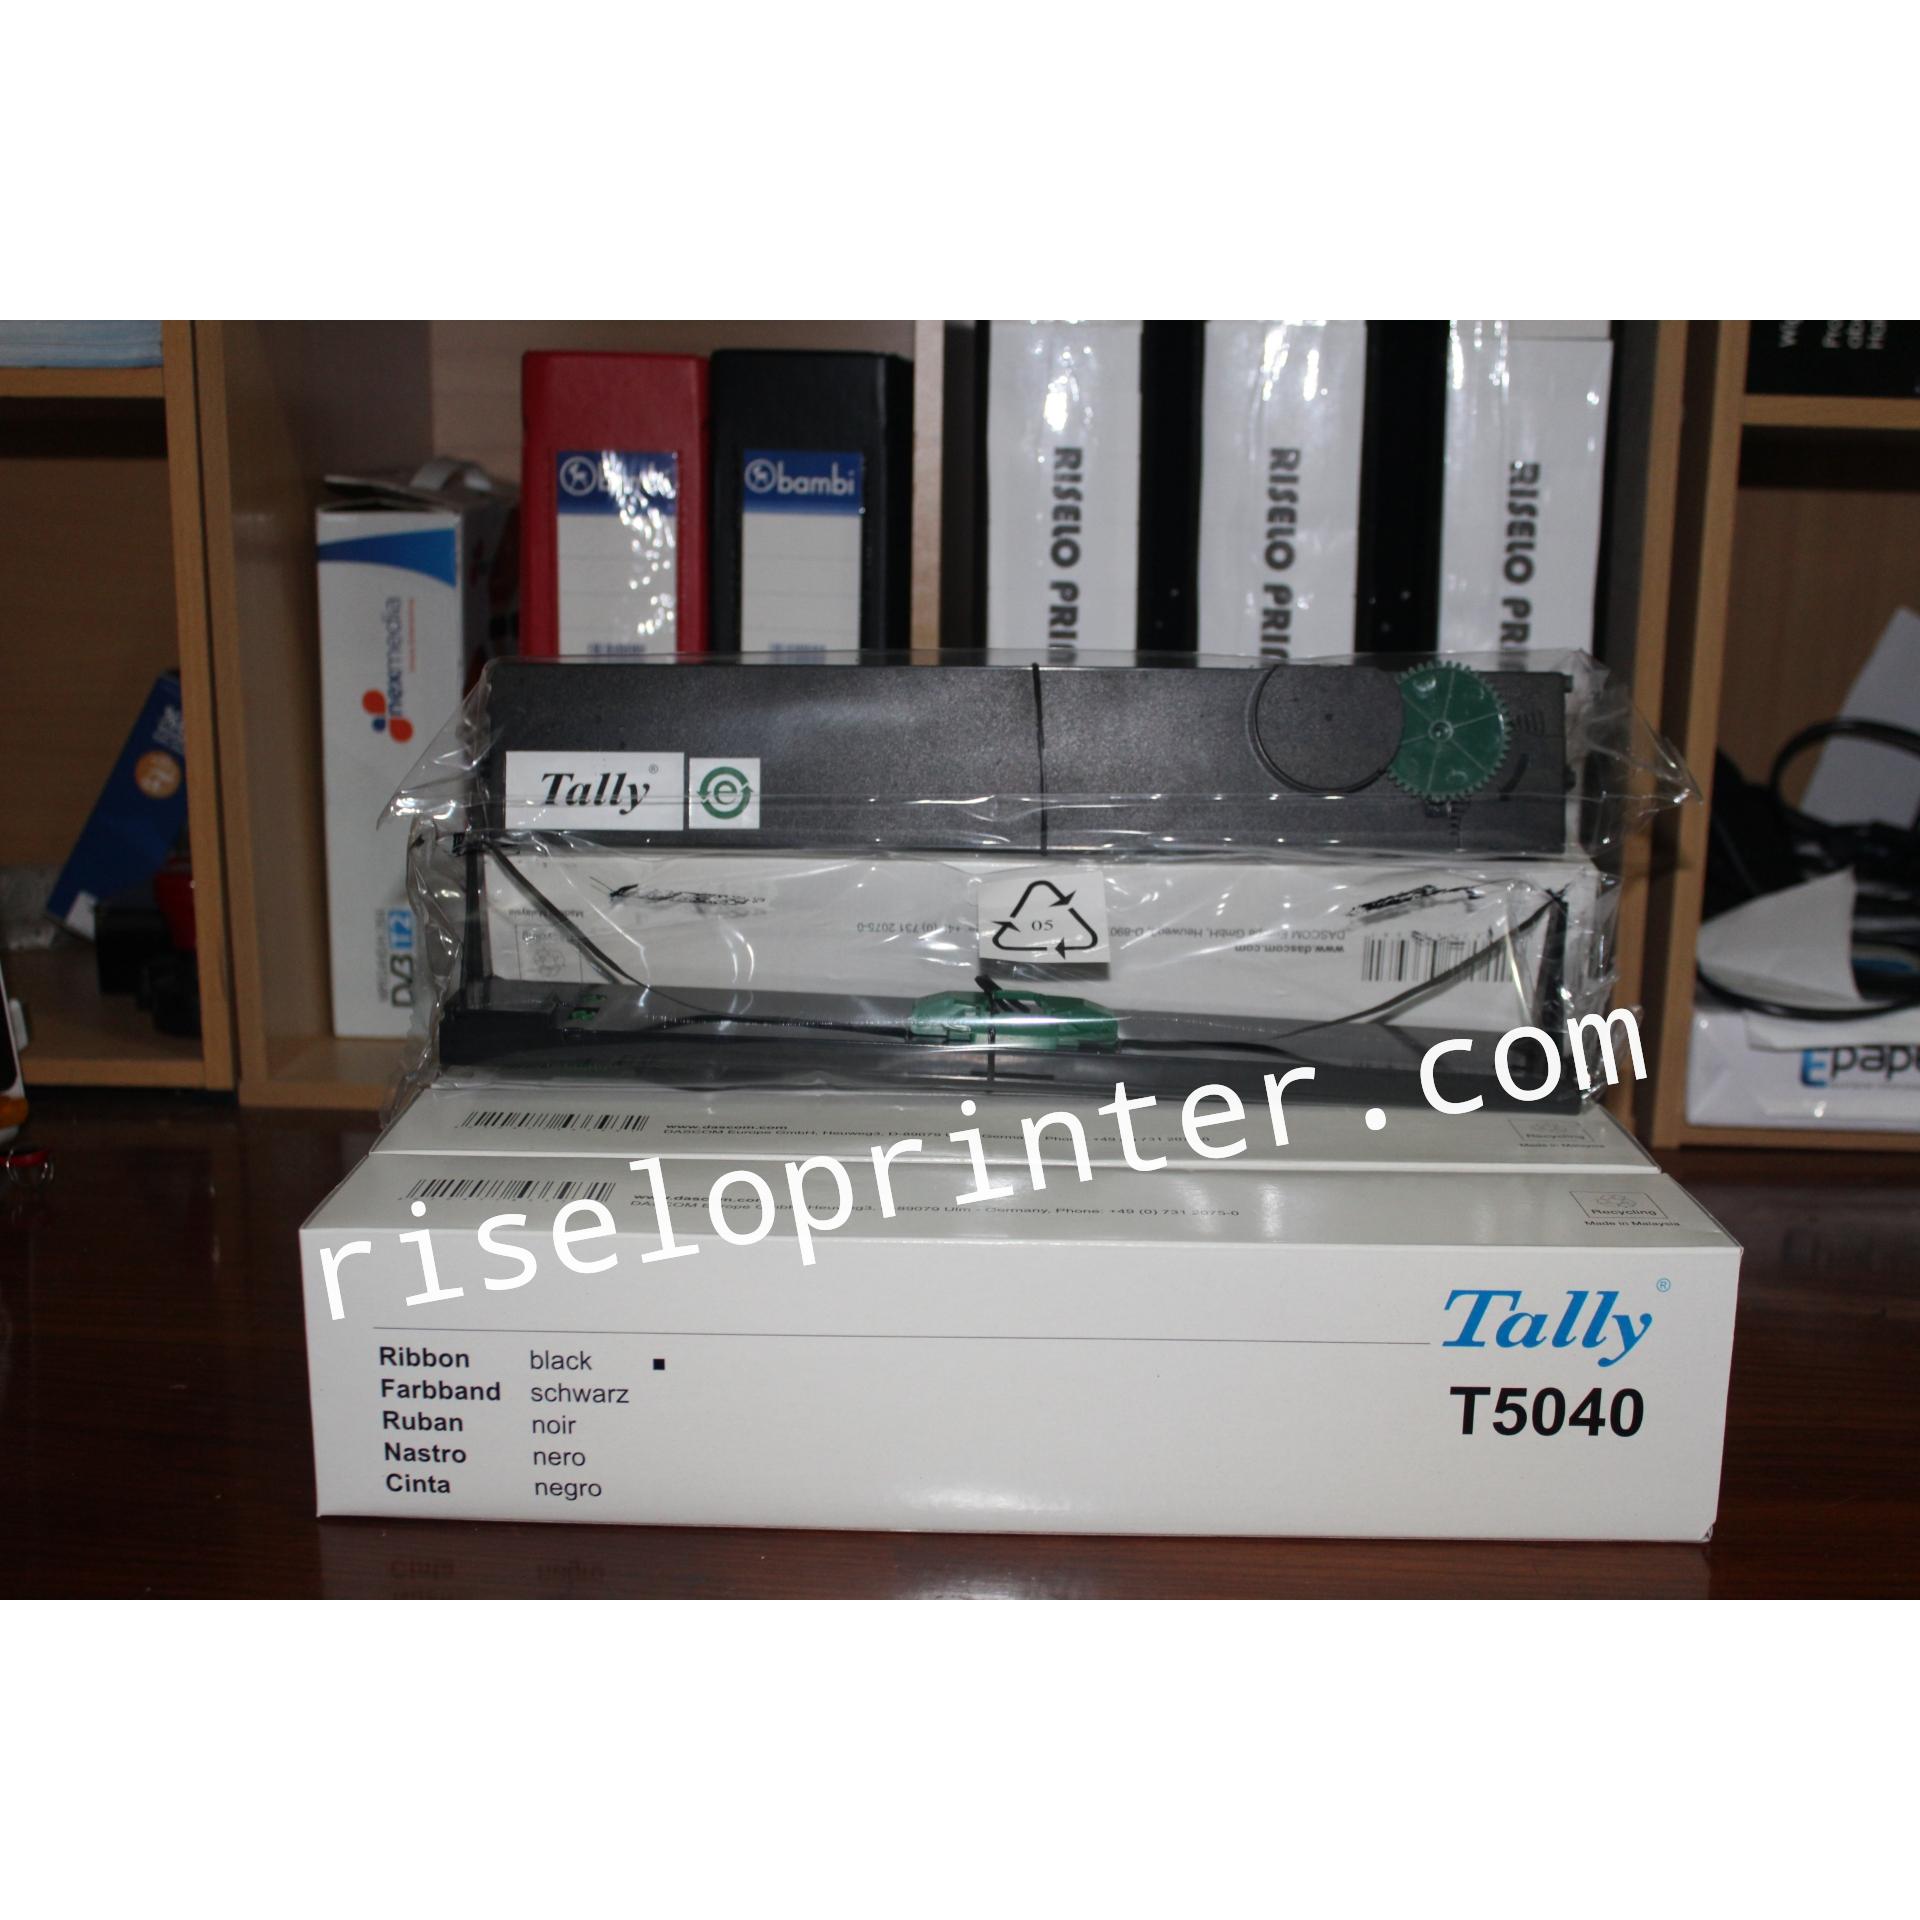 Pita Ribbon Cartridge Tally T5040 Riselo Printer Jakarta Compuprint Sp40 Plus Original